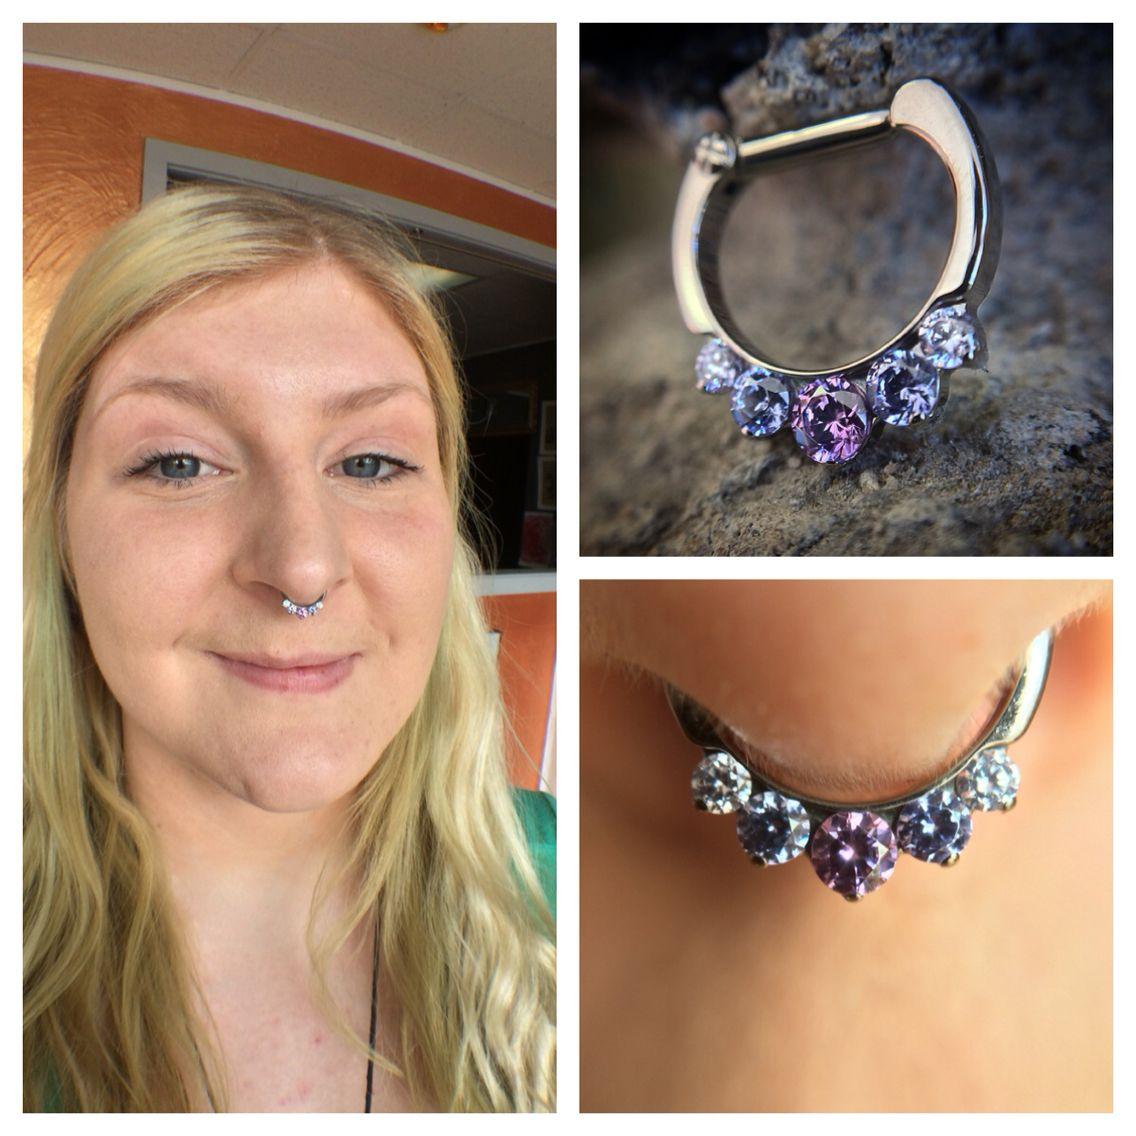 Septum piercing ideas  A gorgeous titanium septum clicker with genuine Swarovski gems from